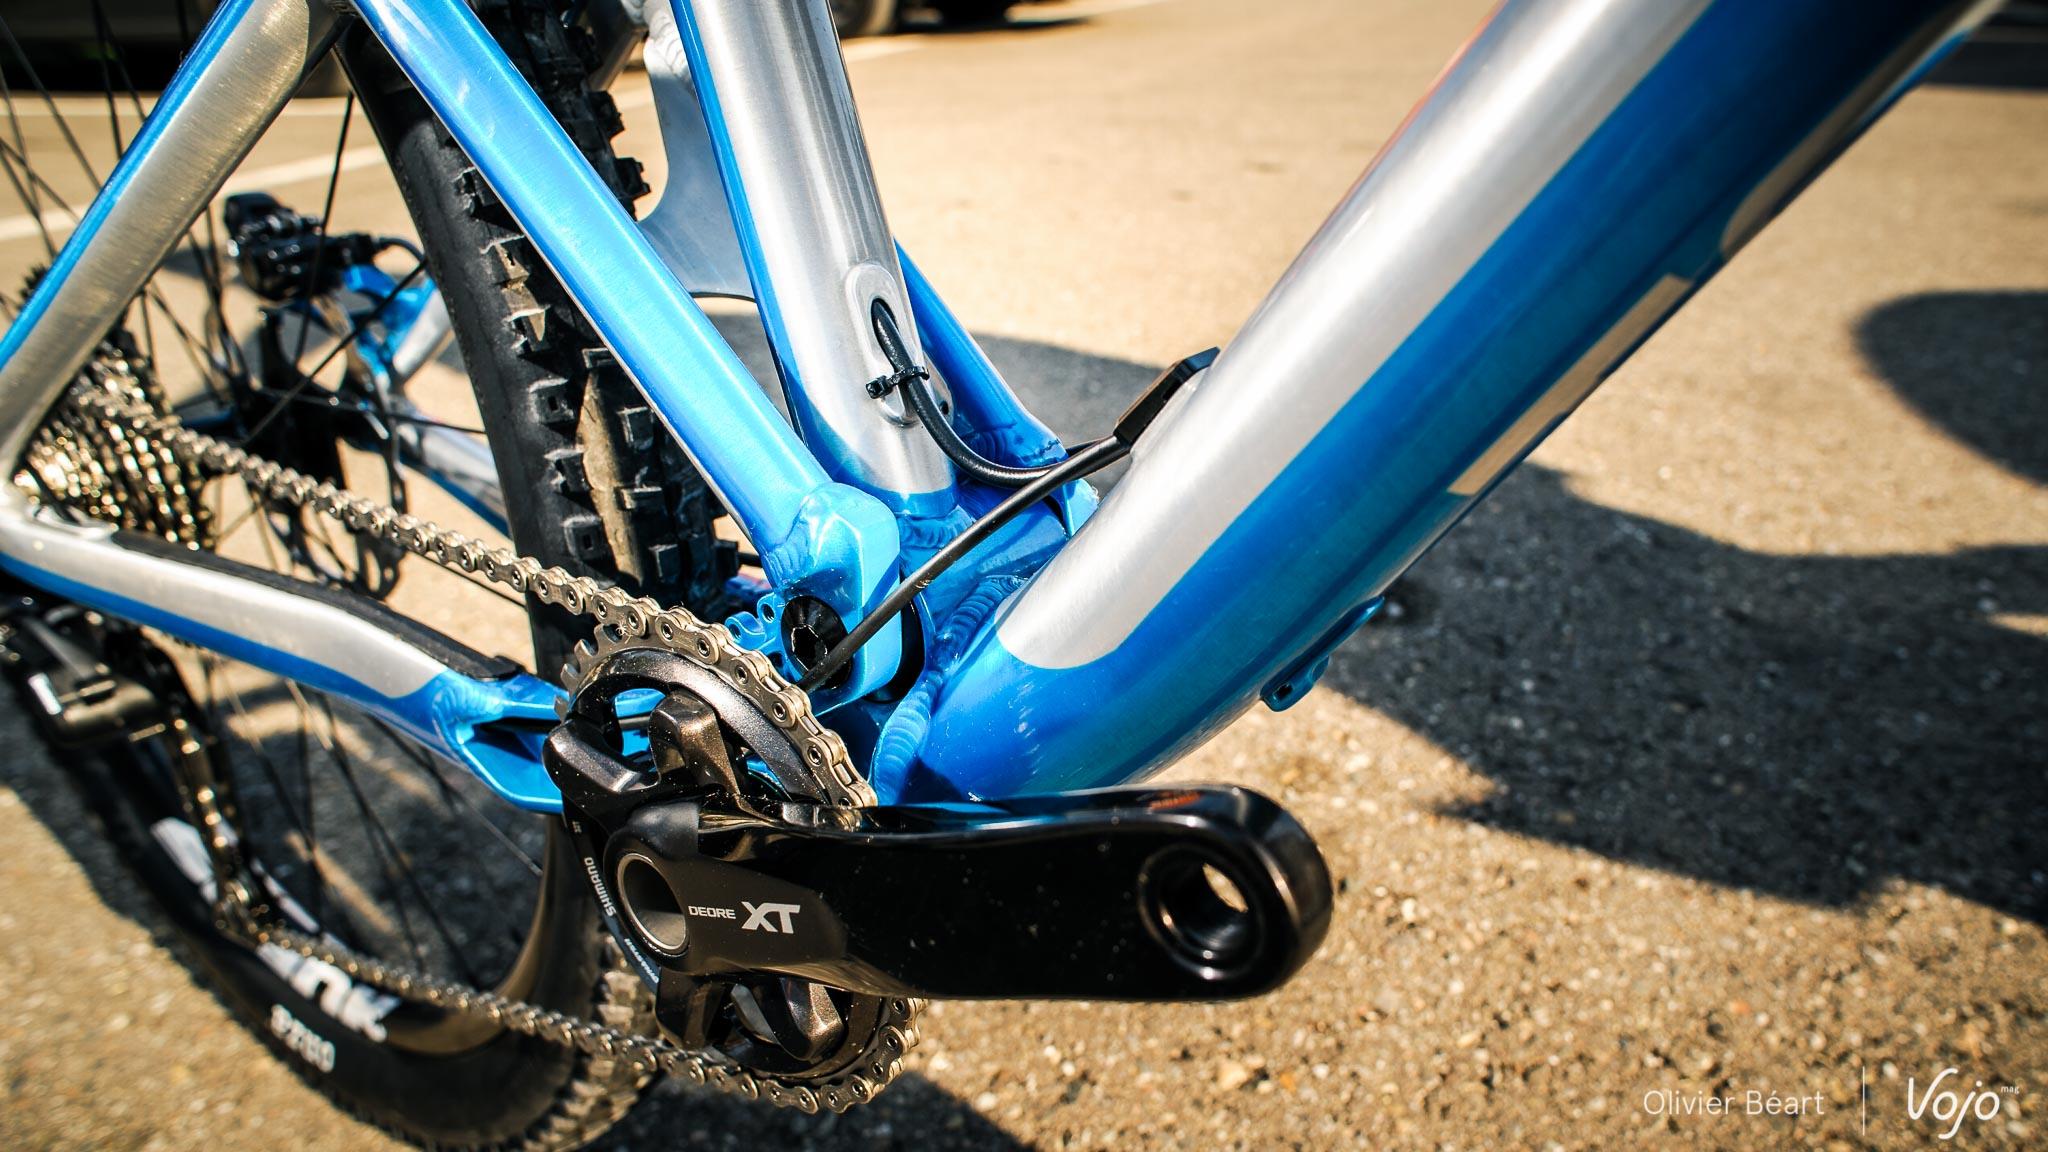 Eurobike_2015_Alutech_ICB_2.0_MTB-News_Copyright_OBeart_VojoMag-4